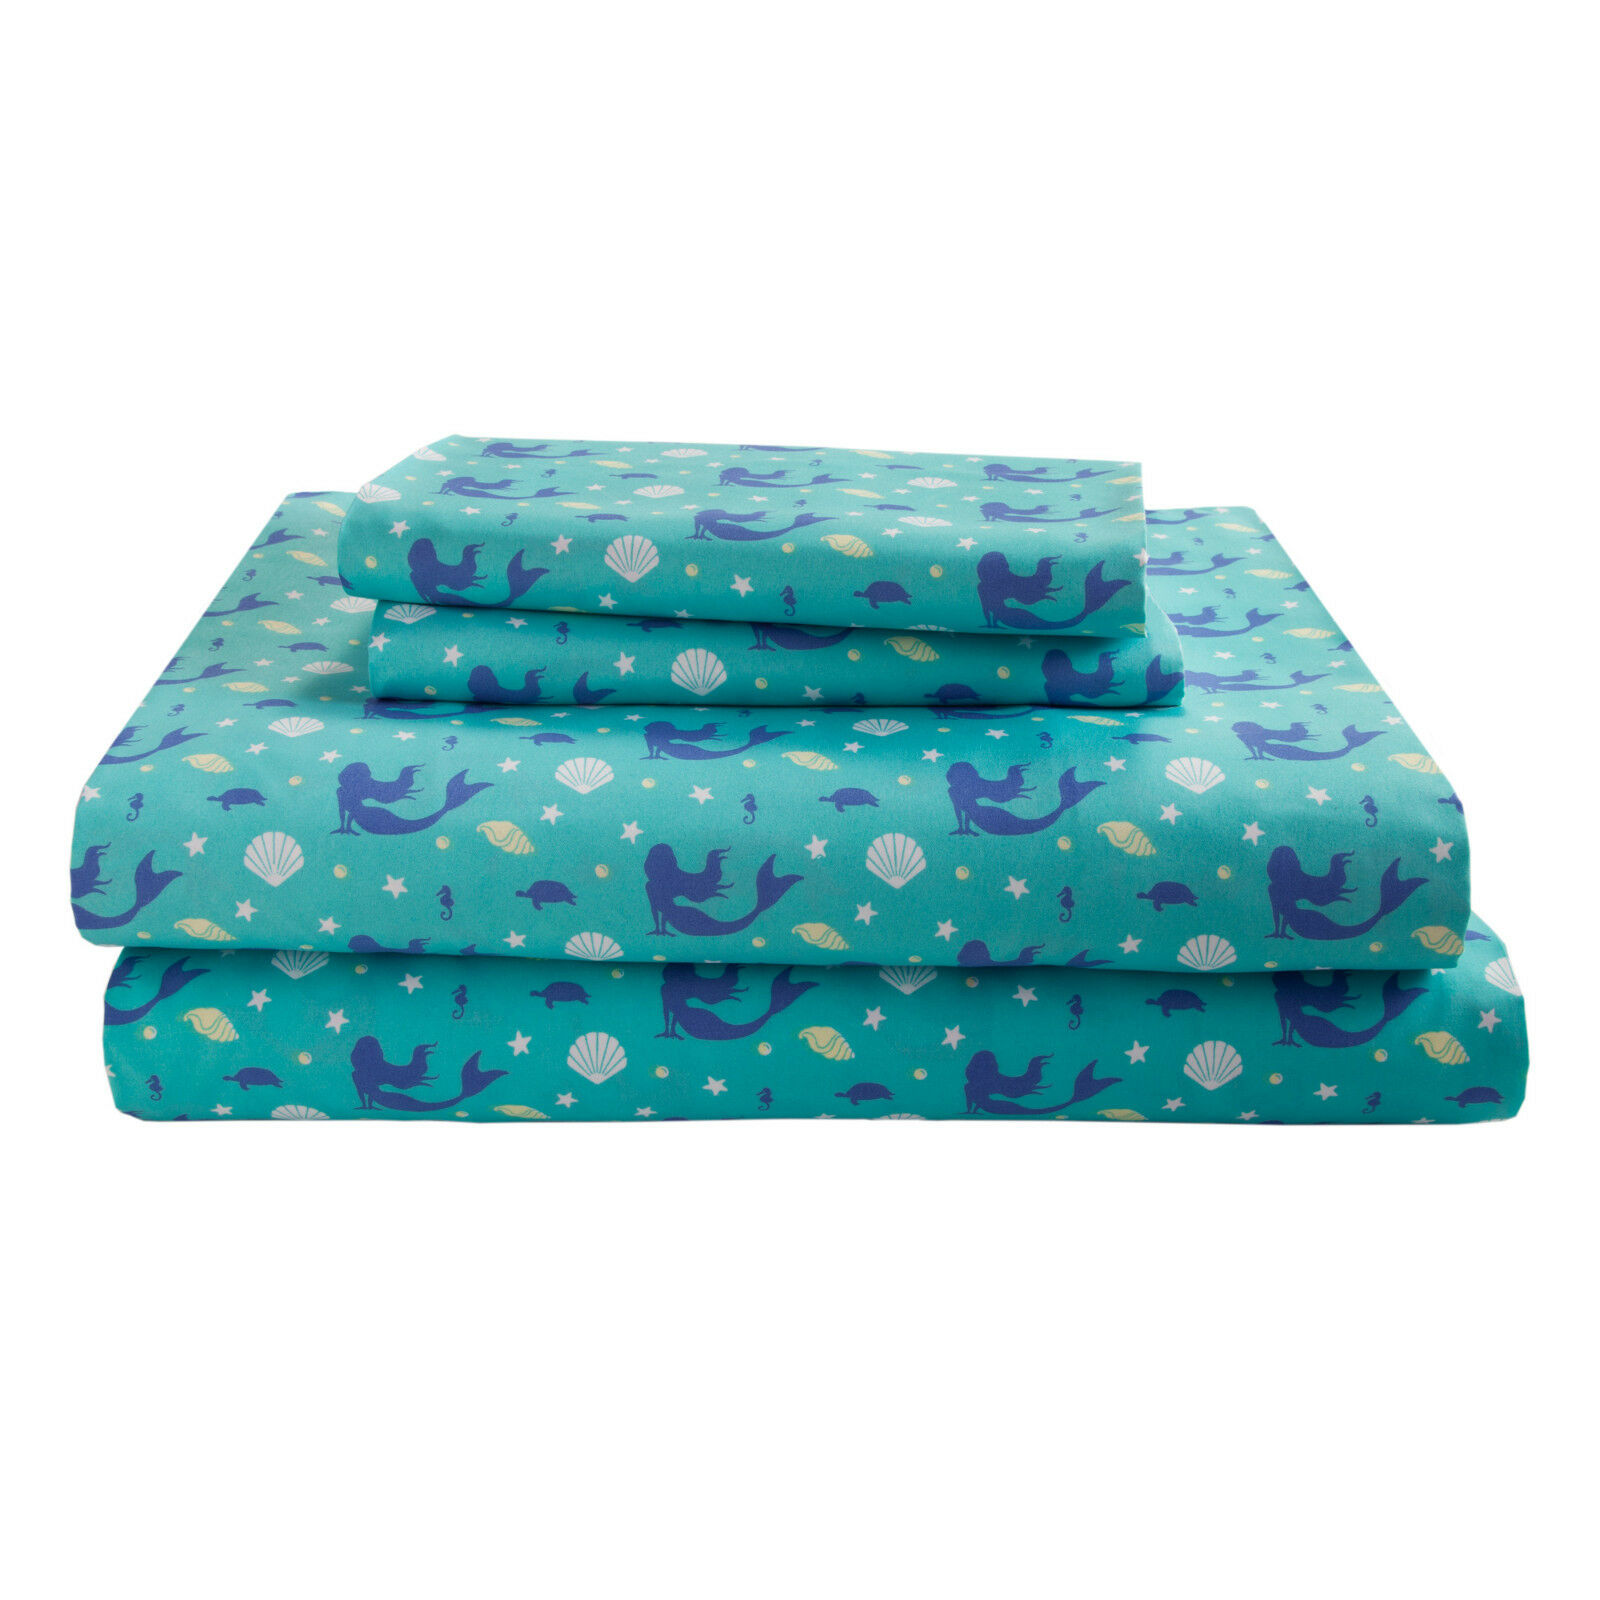 Mermaid Twin Full or Queen Sheet Set Microfiber Coastal Ocean Bedding, Teal Blue Bedding